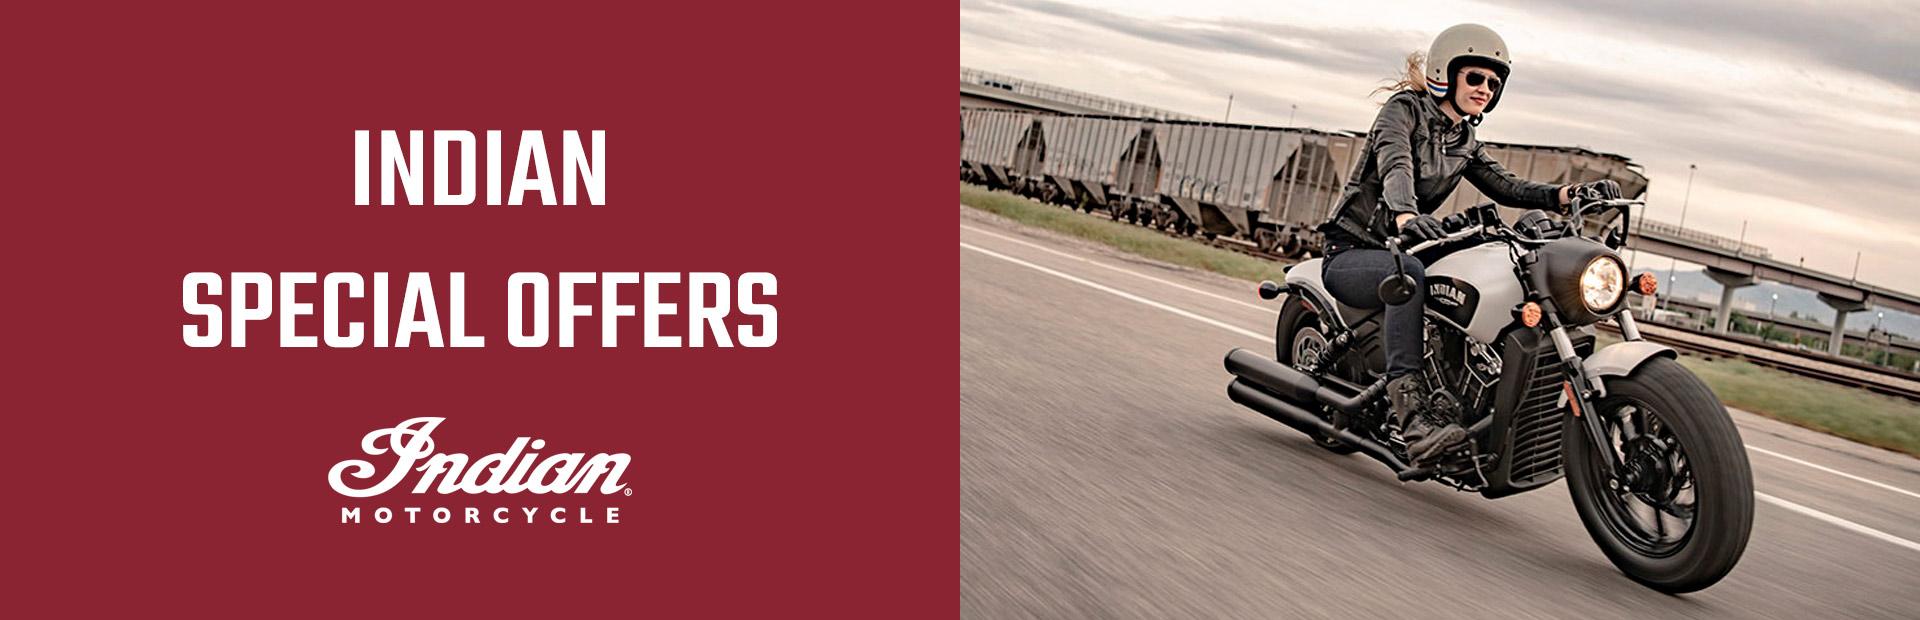 Wagner Motorsports Powersports Dealer in Worcester, MA (508